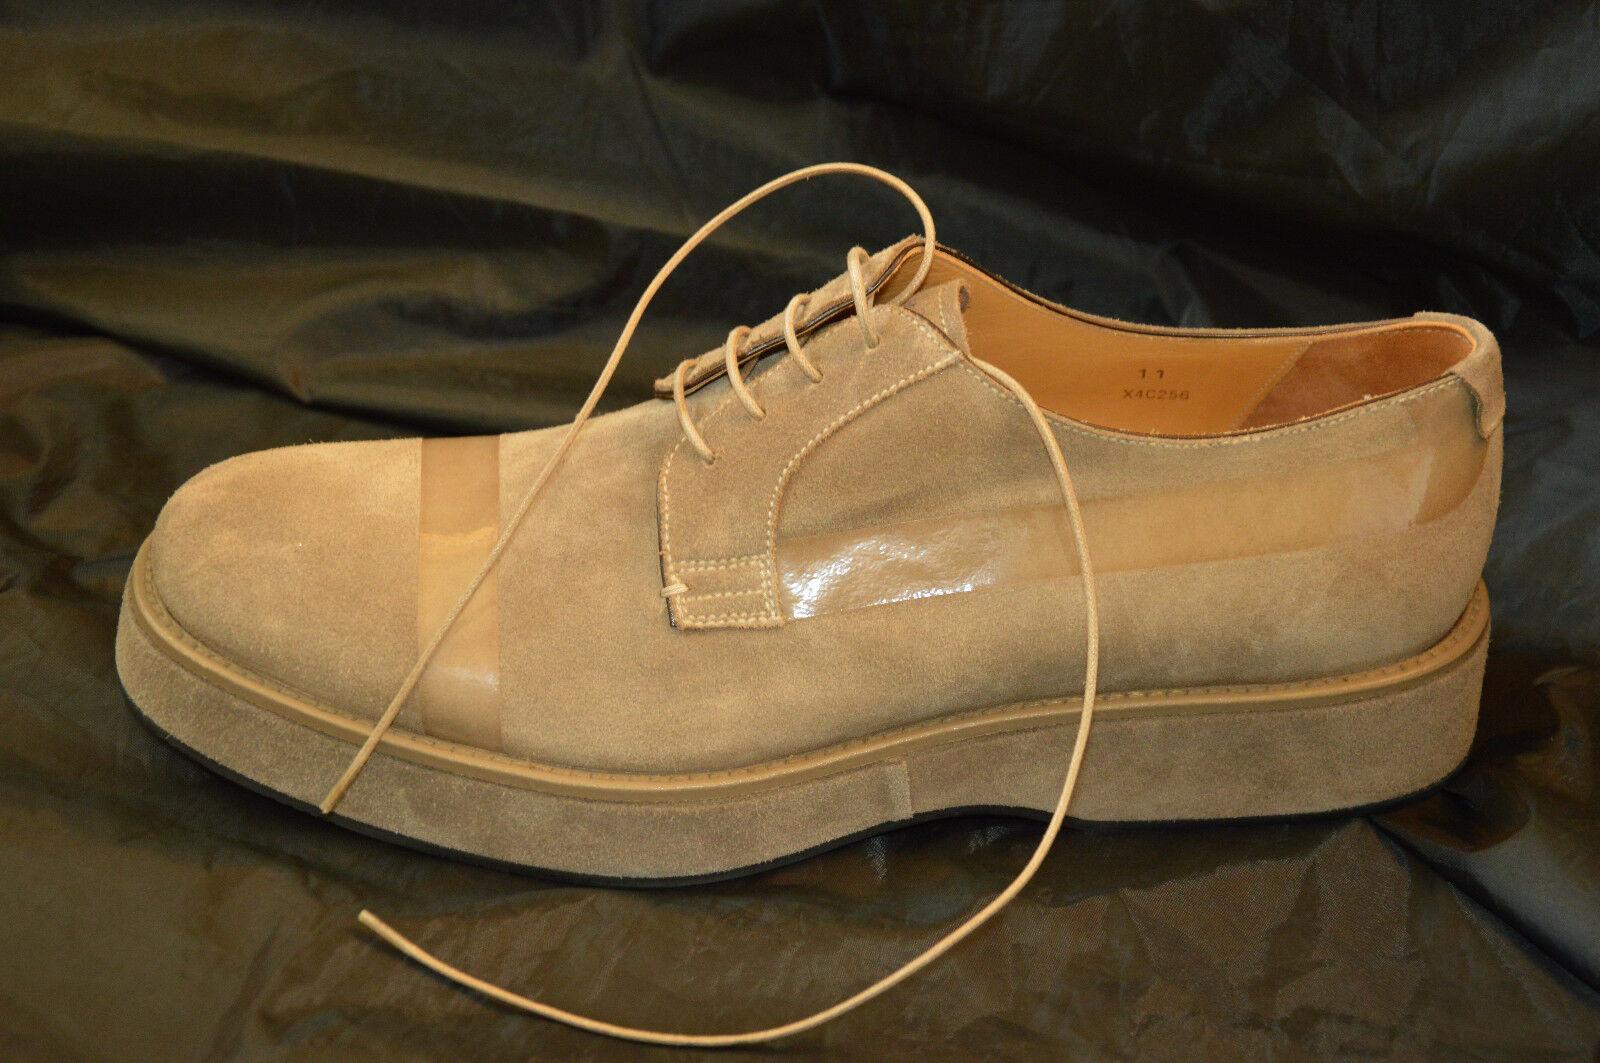 Emporio Armani echt Leder Schuhe 45 11 NEU